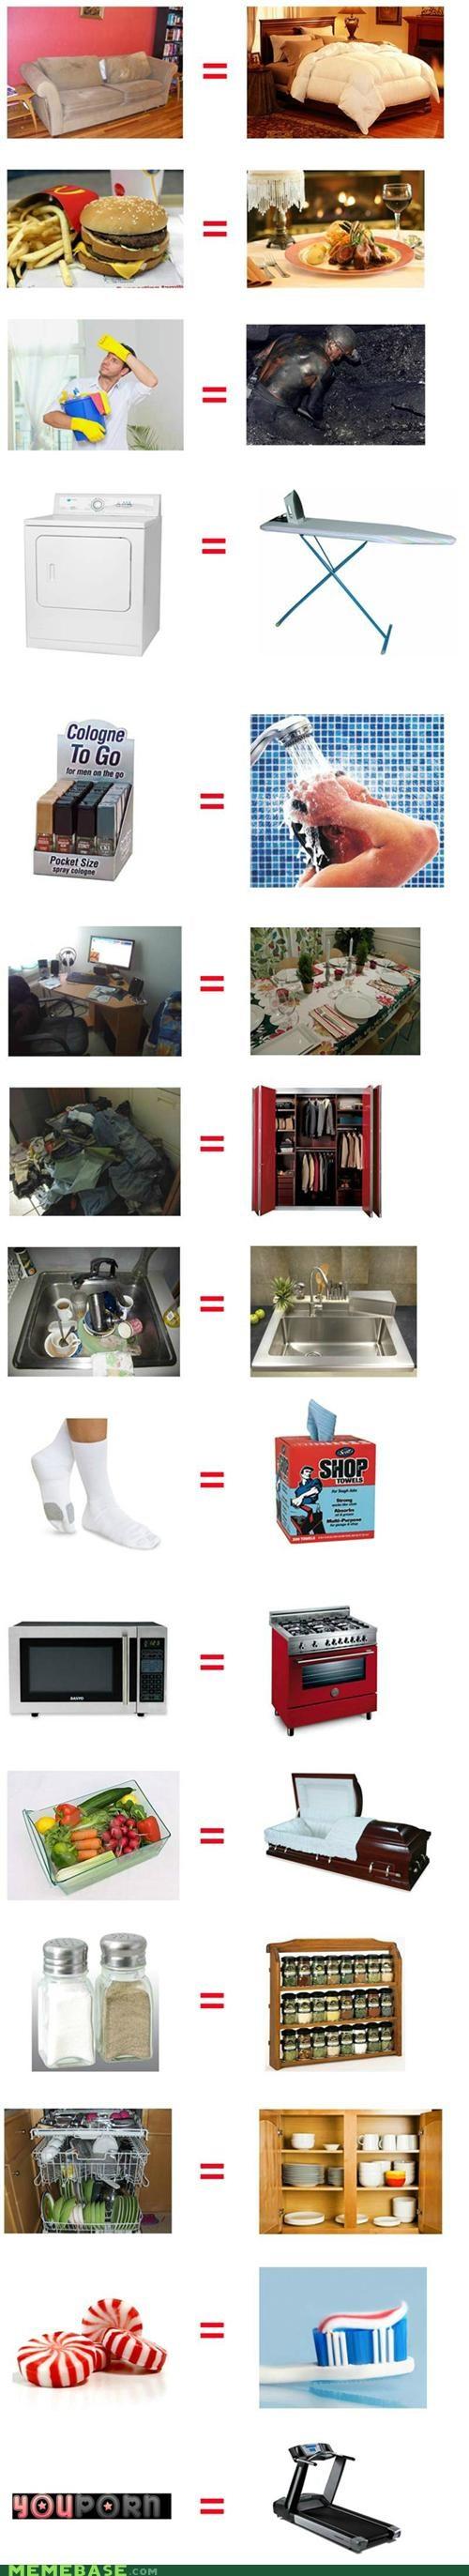 bachelor chores foul bachelor frog guide hard life - 5414384128